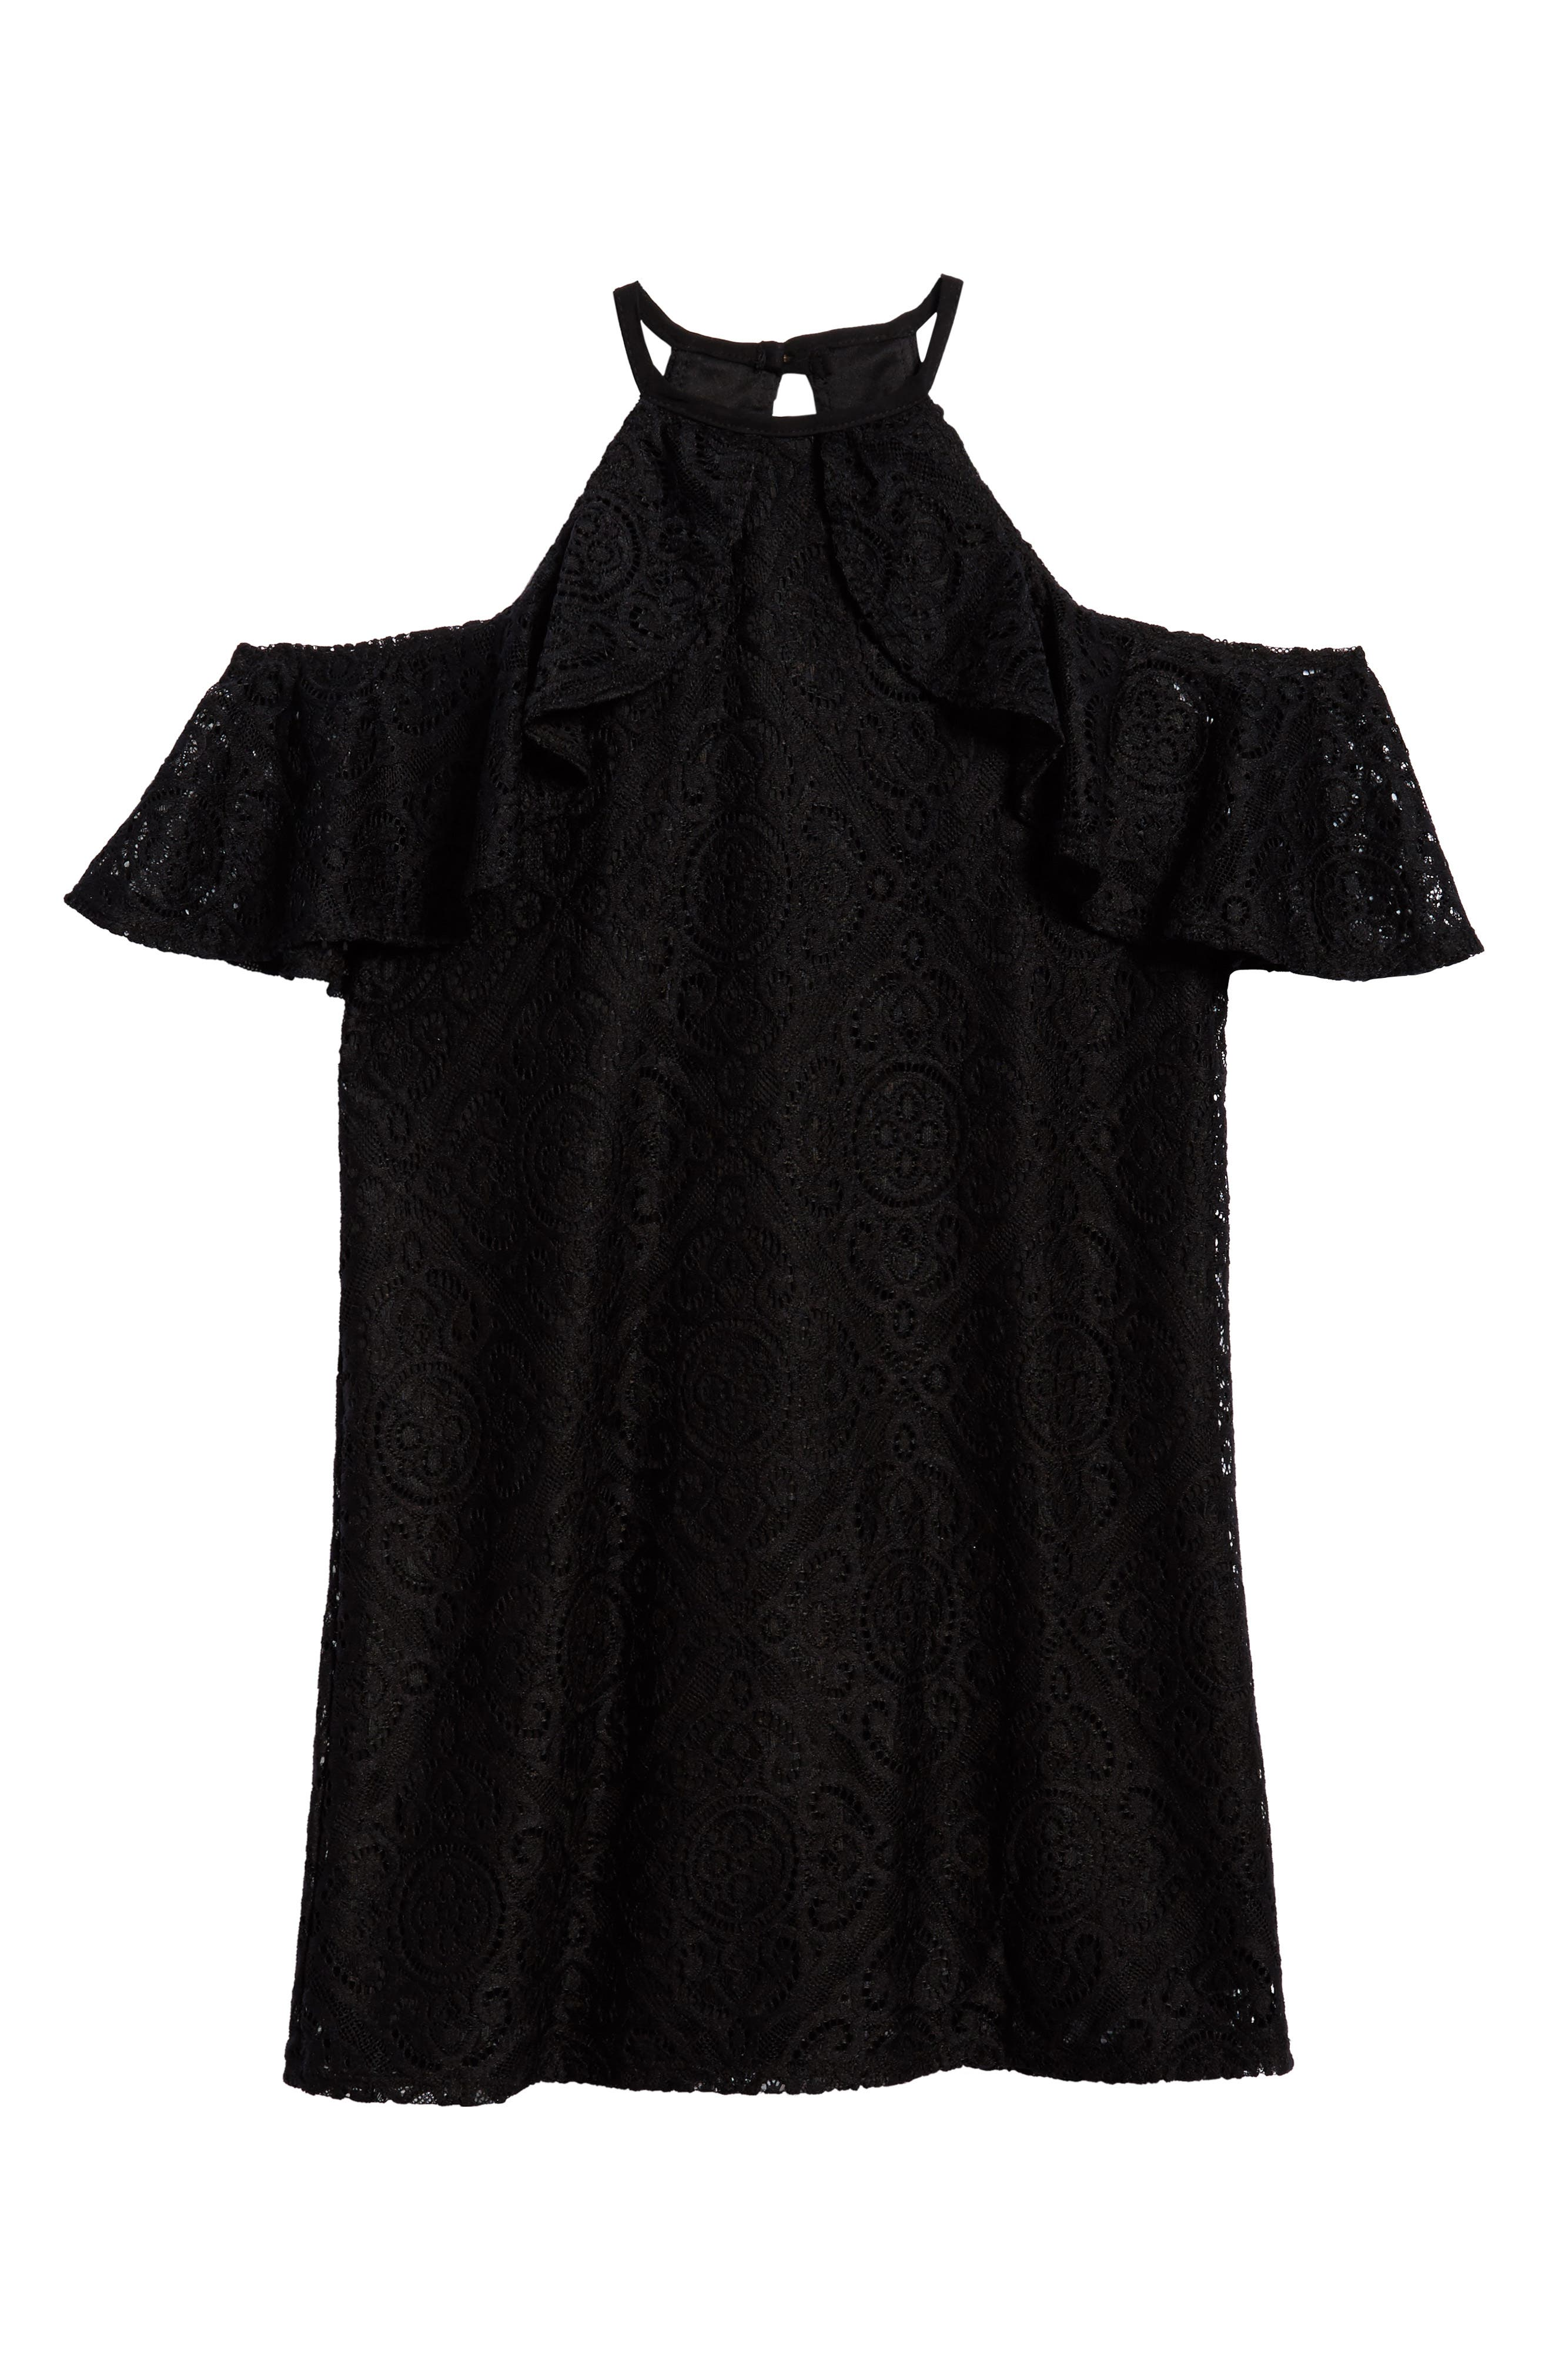 Lace Ruffle Cold Shoulder Dress,                             Main thumbnail 1, color,                             Black